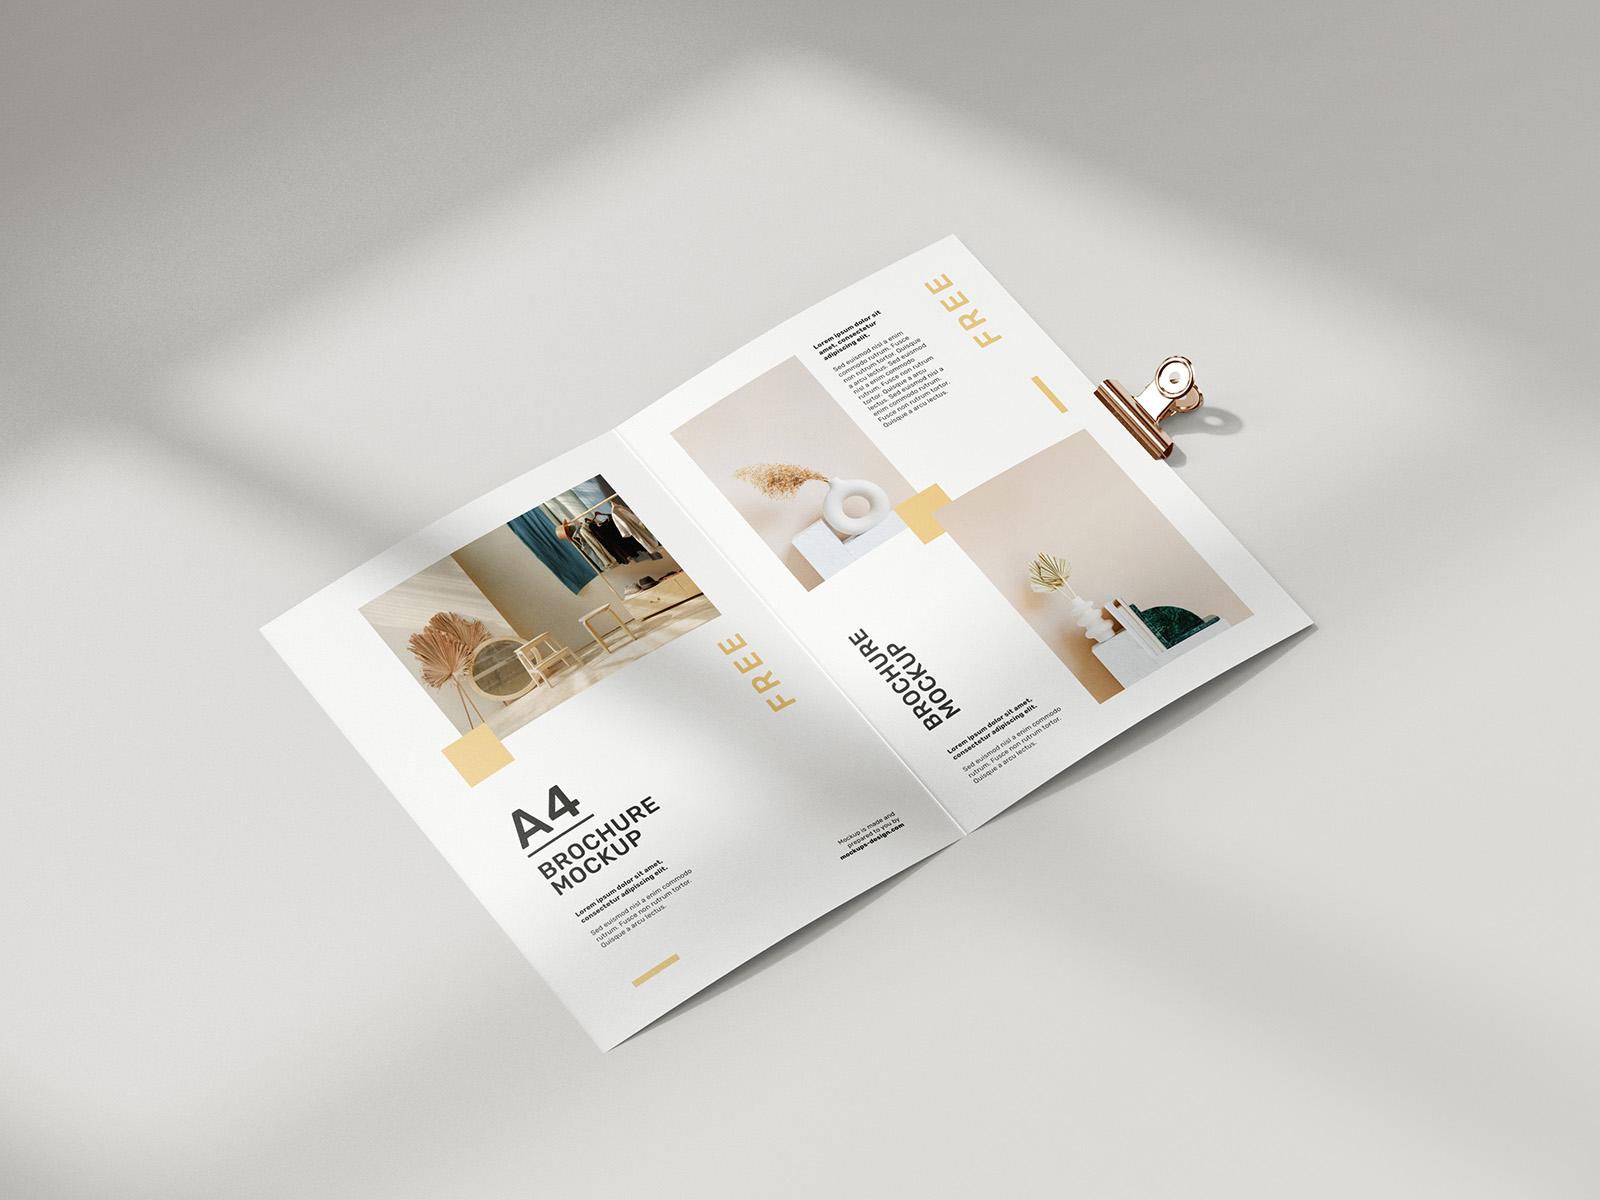 Free folded A4 brochure mockup